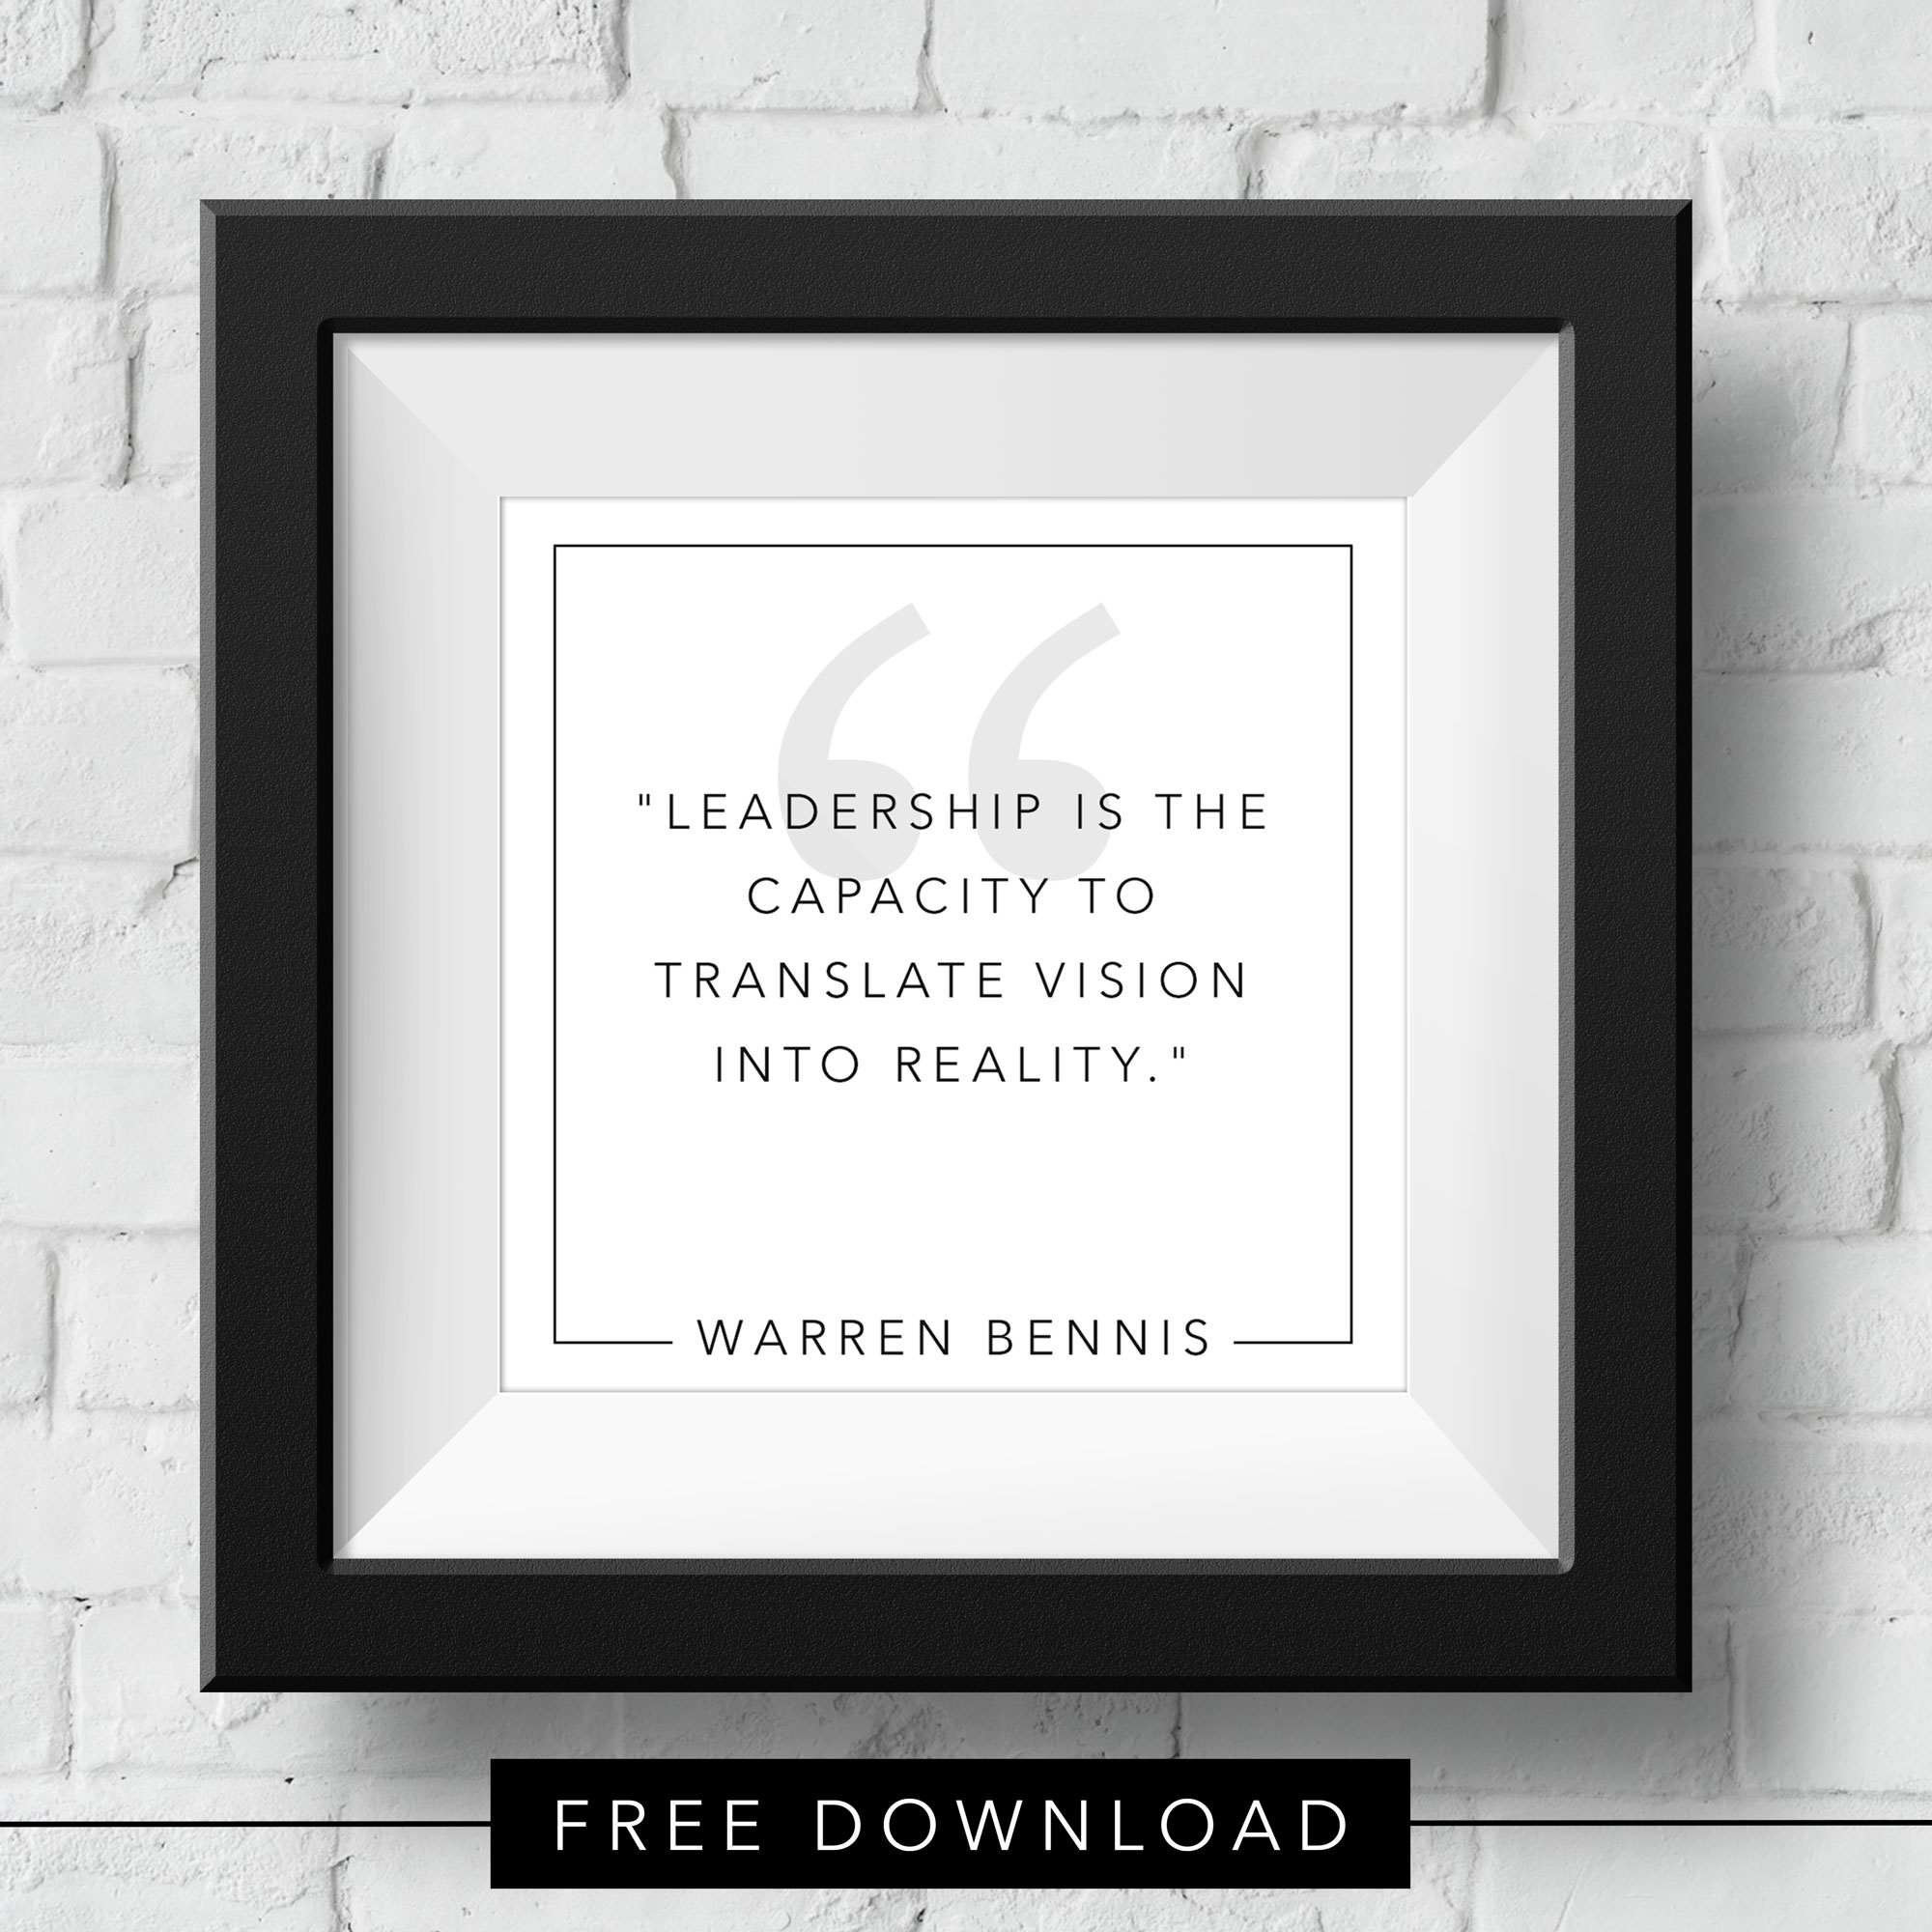 leadership-warren-bennis-free-download